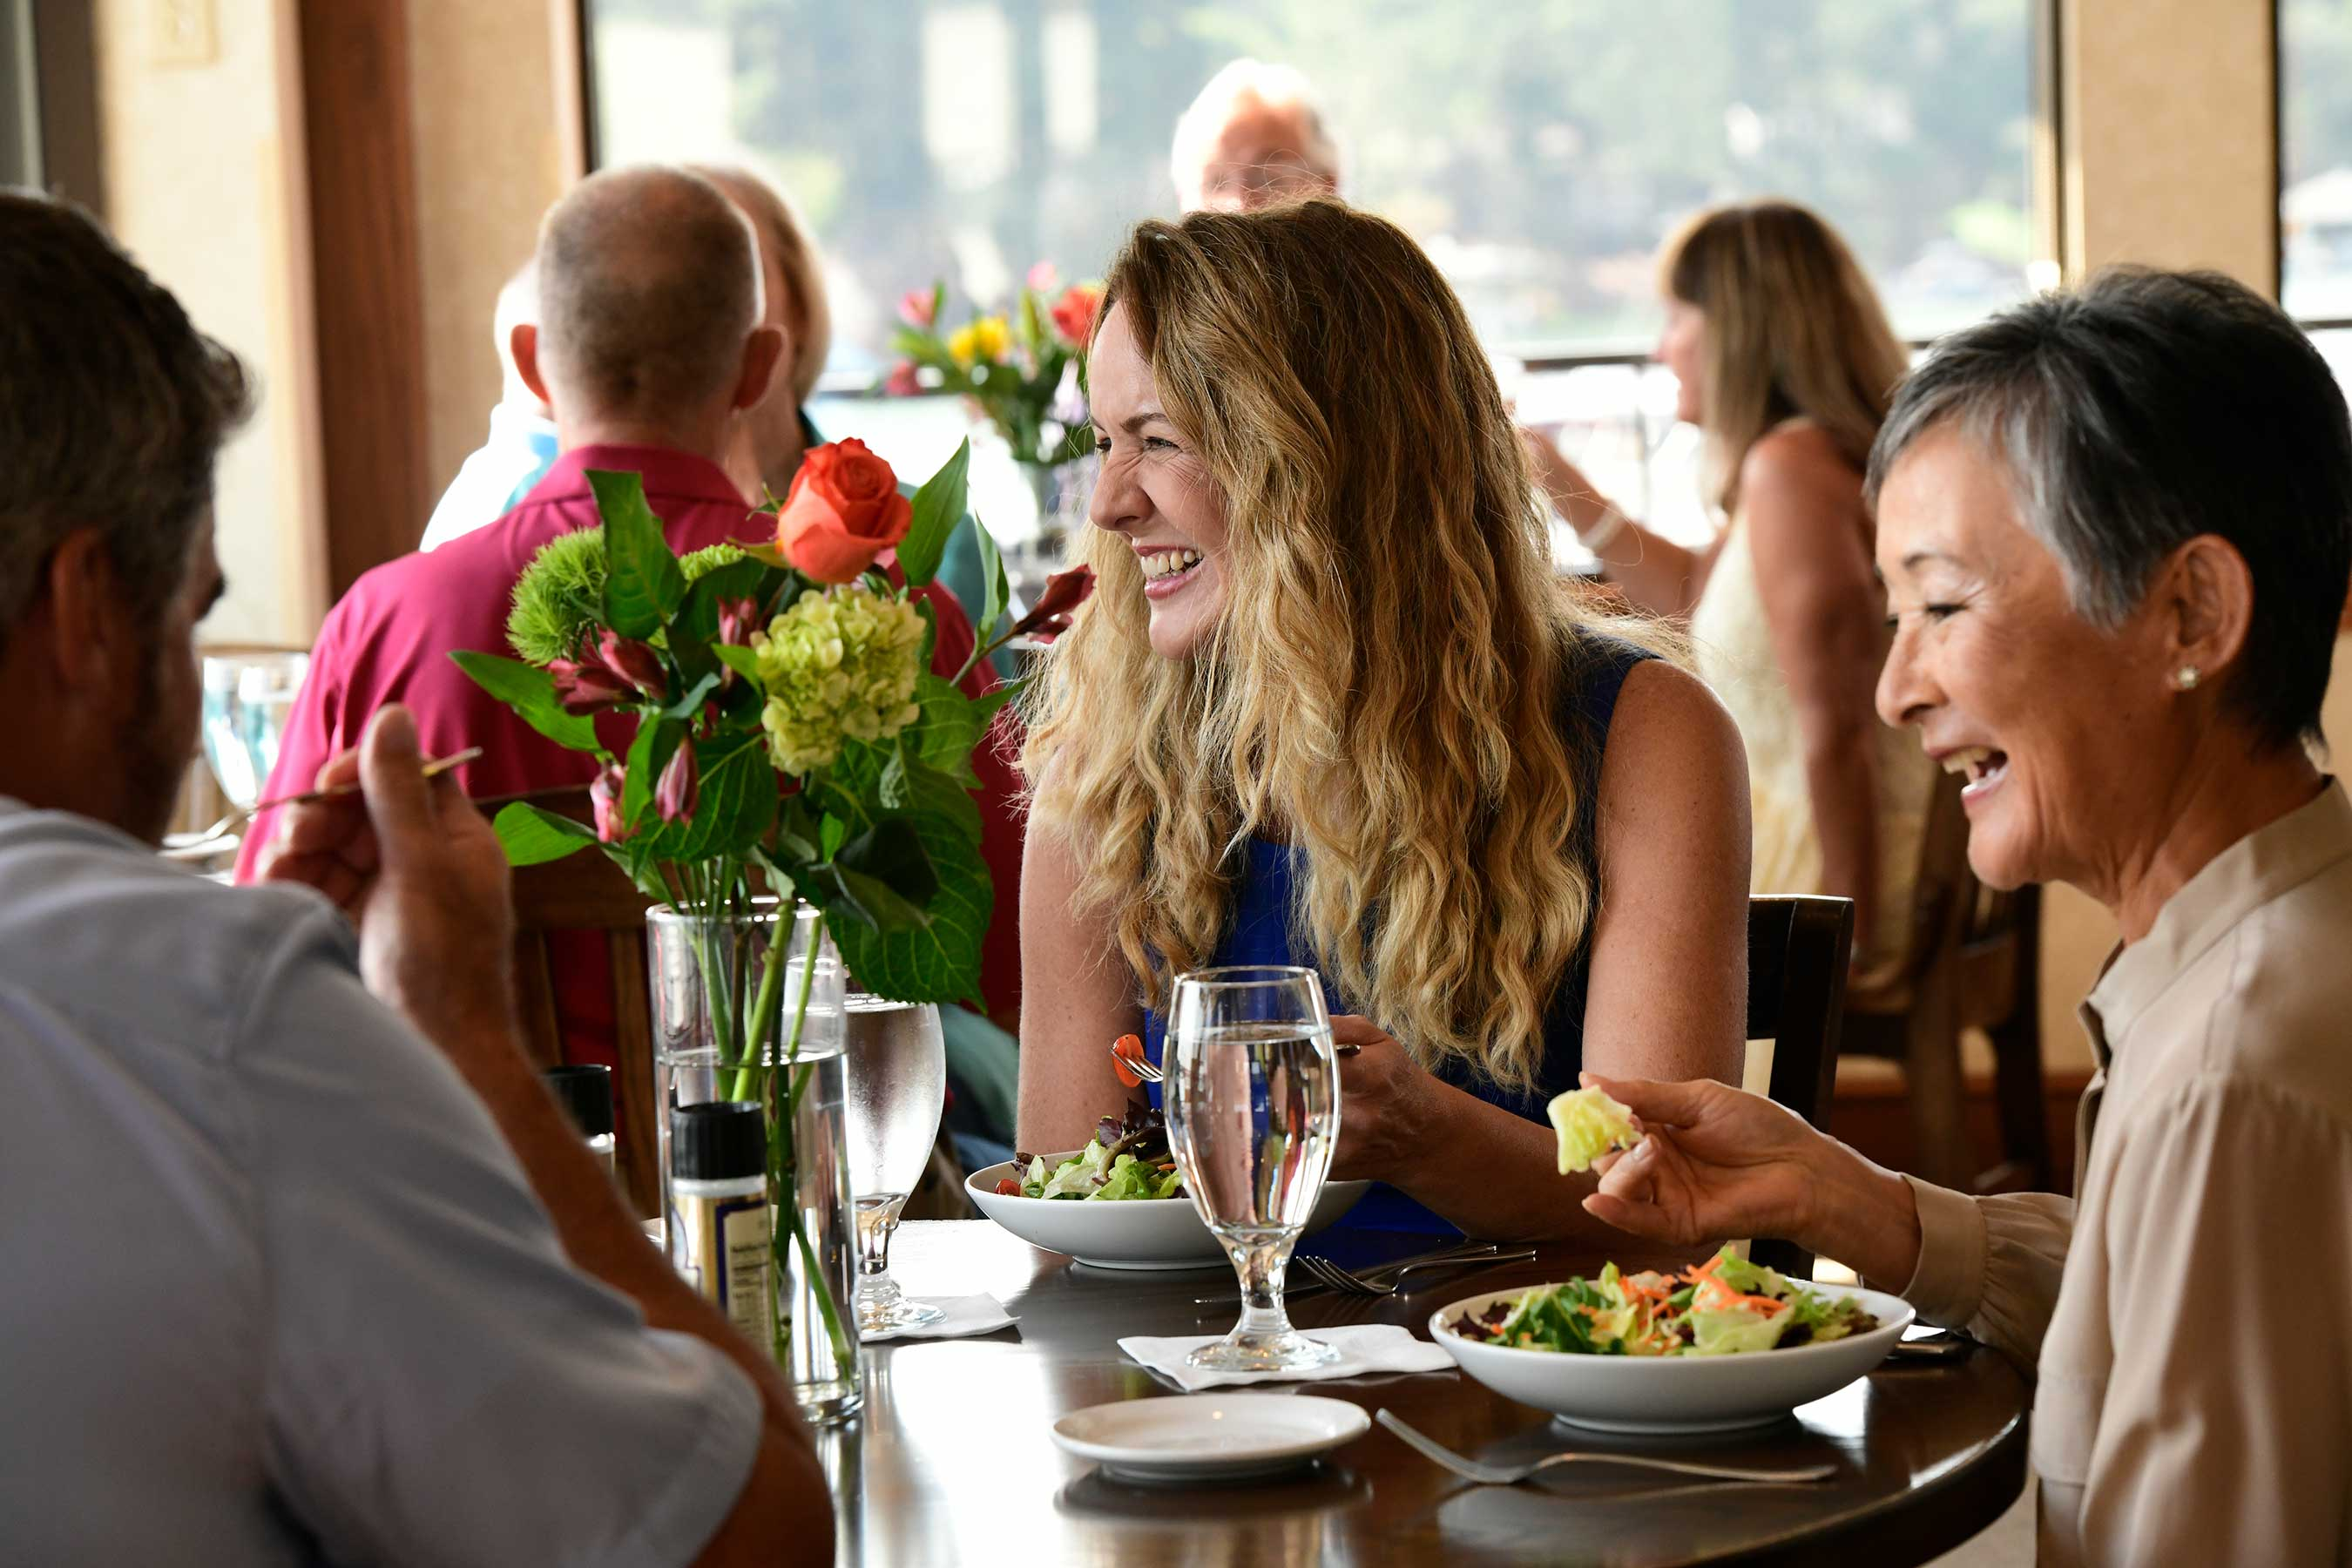 Tellico Village offers a vibrant social landscape for building lasting friendships.